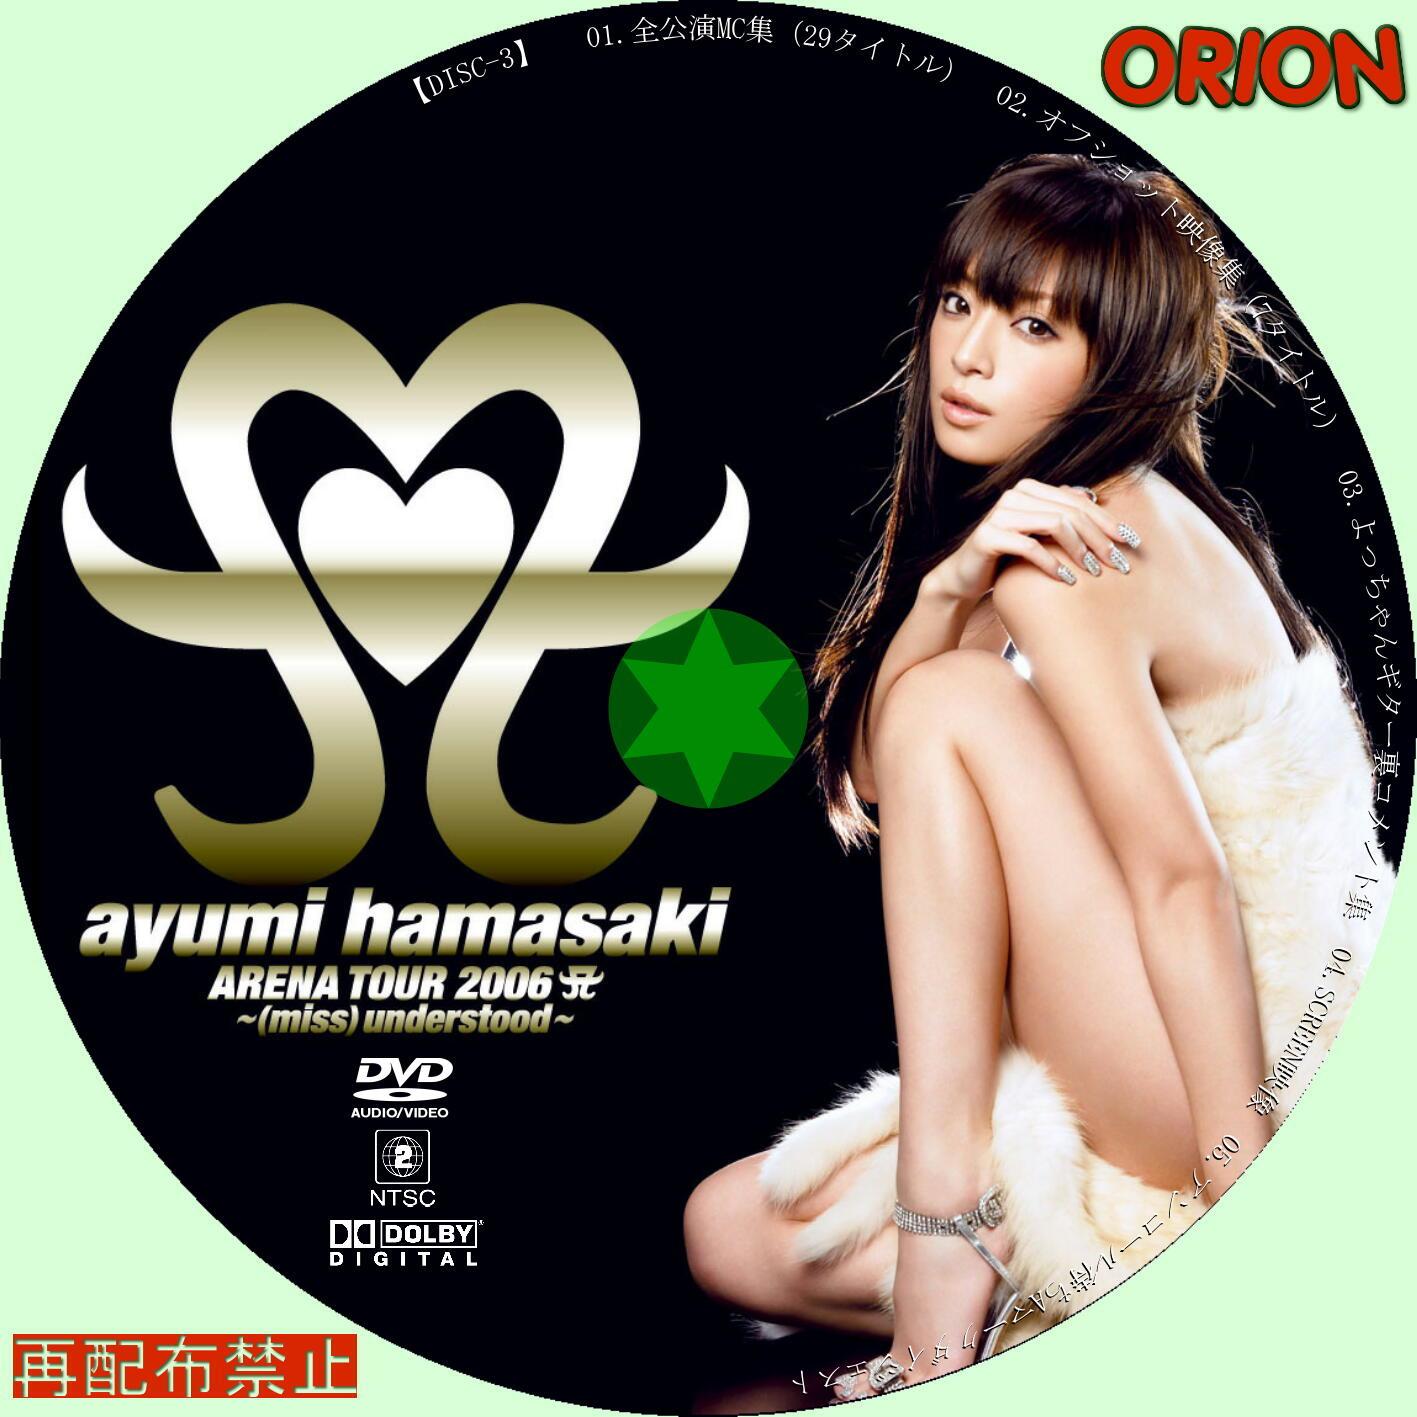 ayumi hamasaki arena tour 2005: